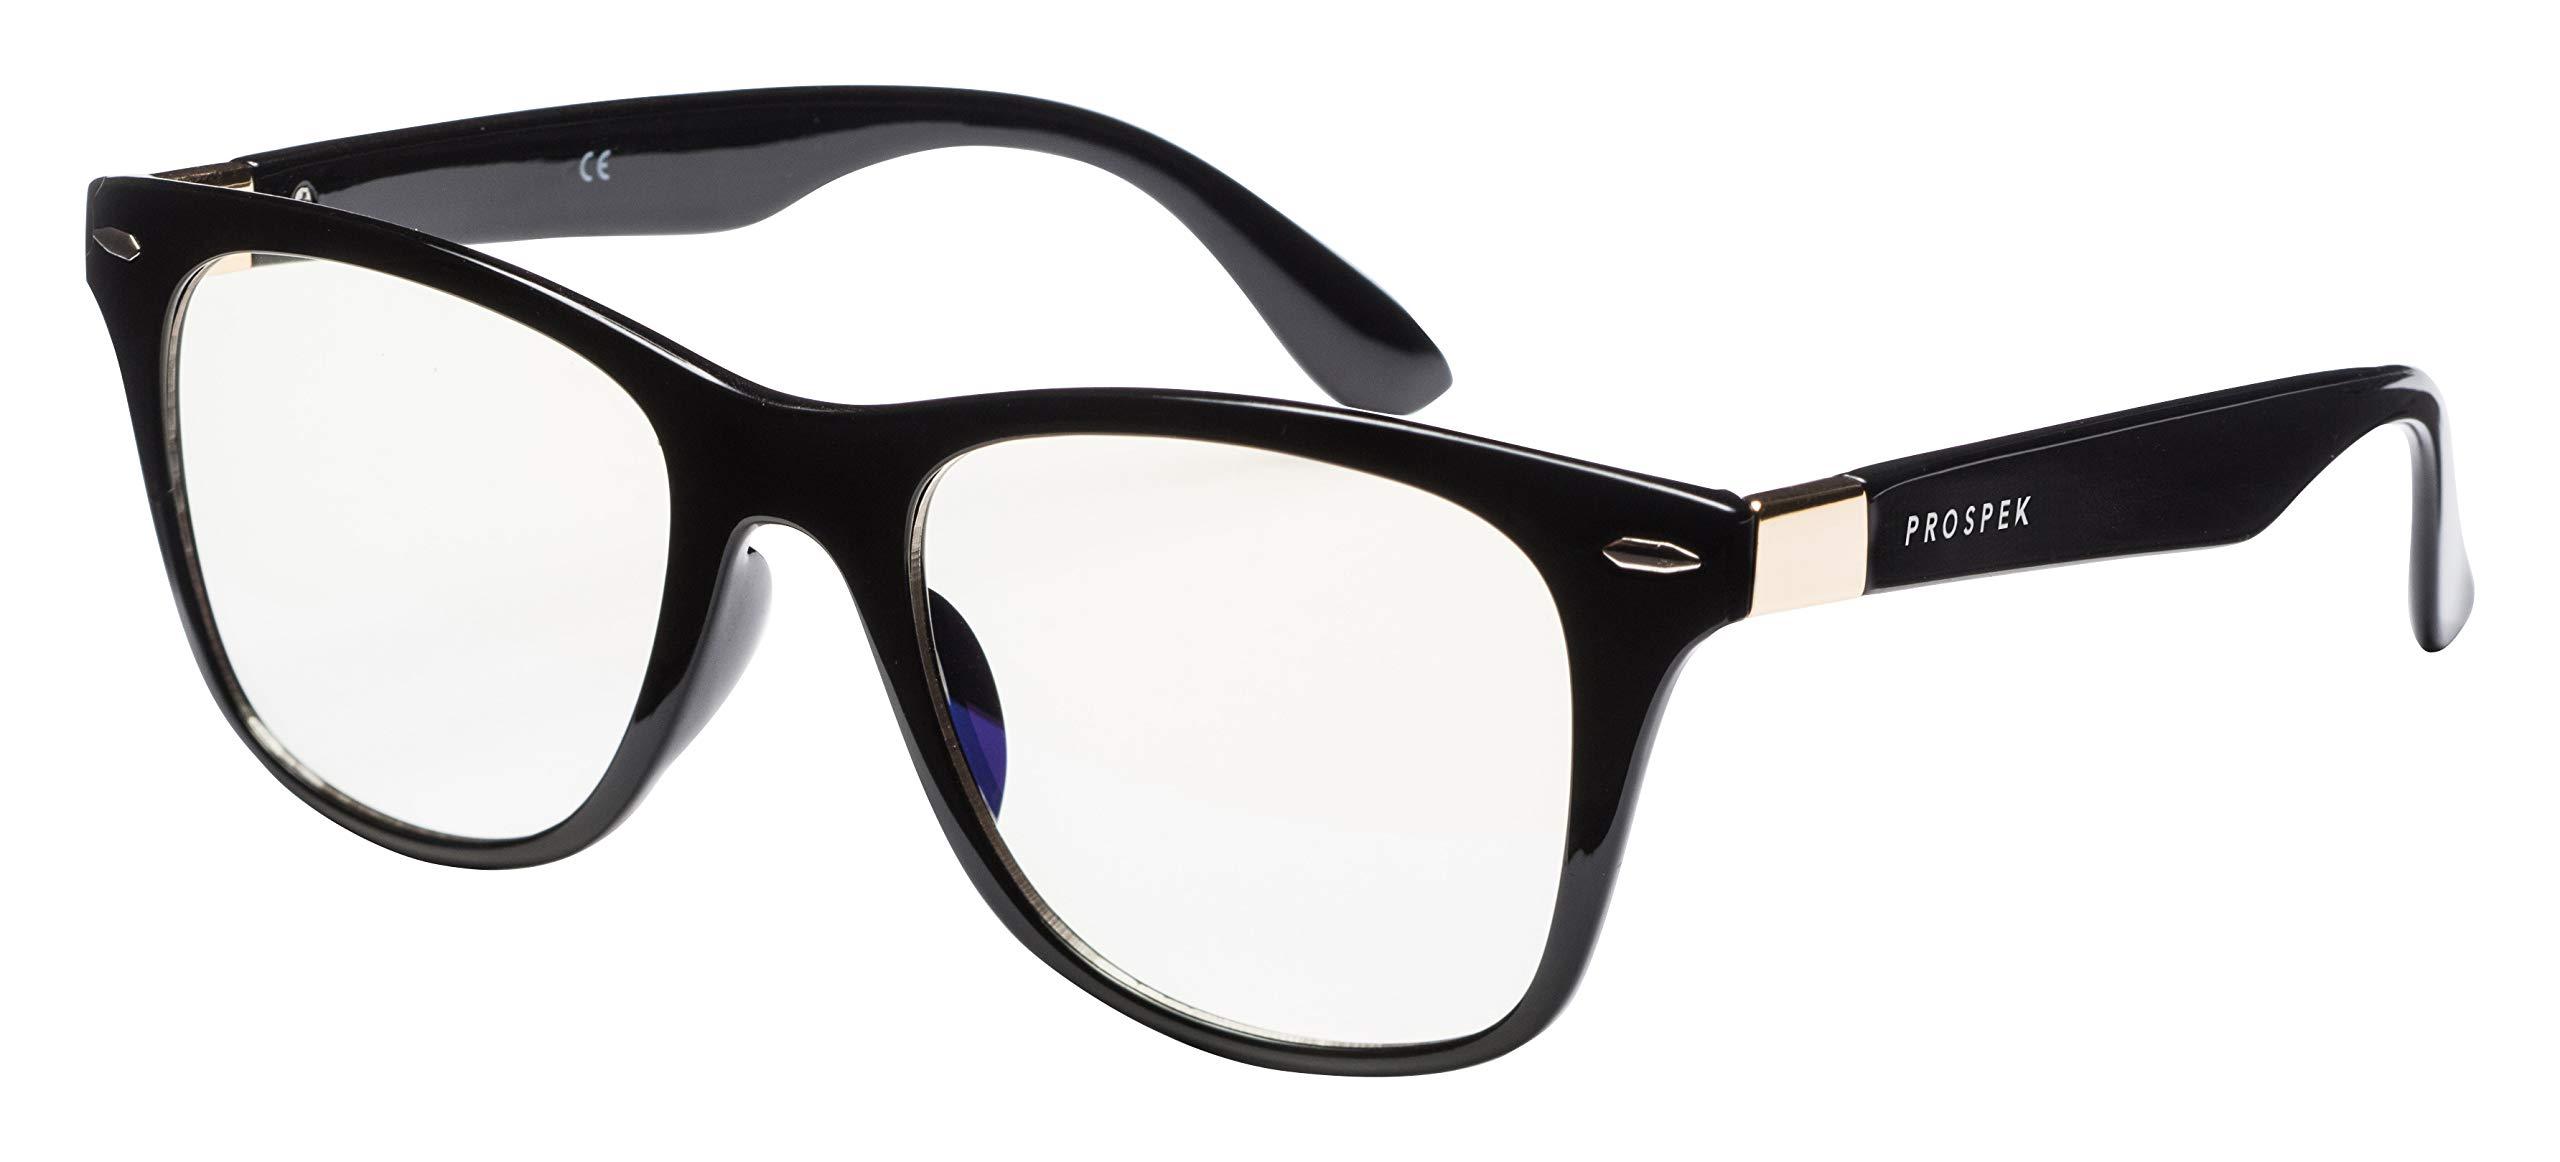 PROSPEK - Anti Blue Light Computer Glasses - Wayfarer - Protect Your Eyes. Manufactured by Spektrum Glasses